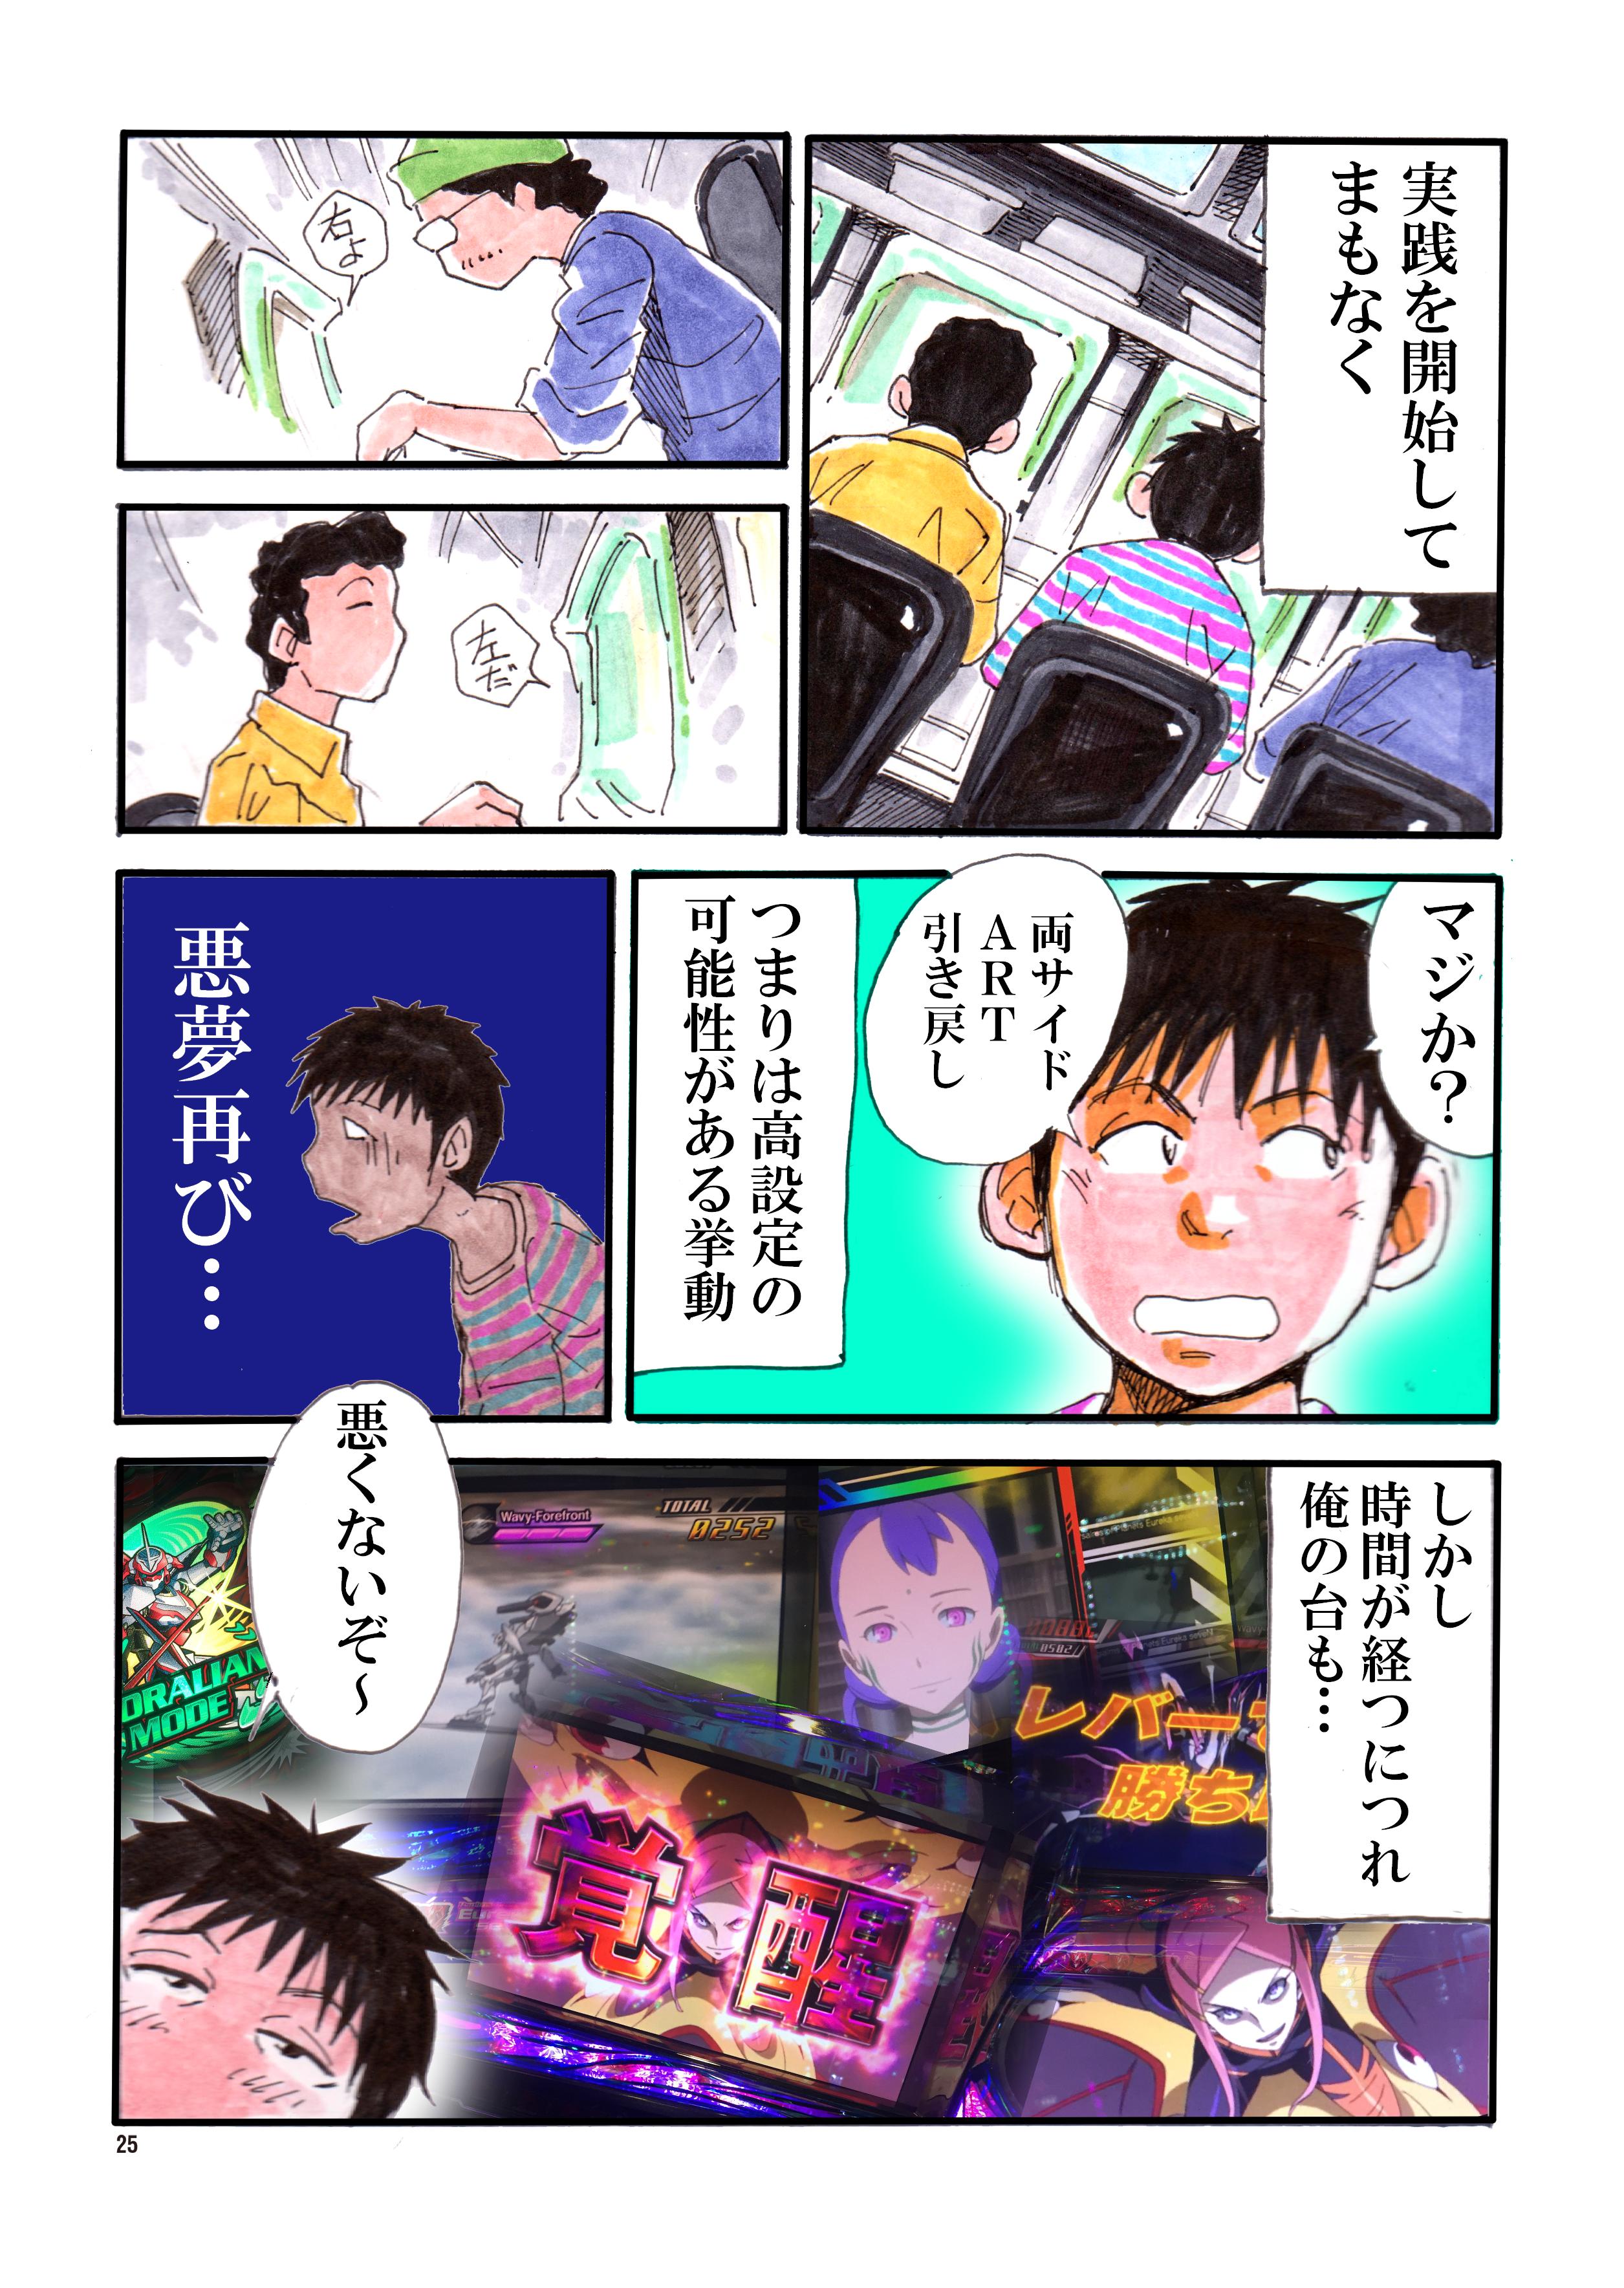 vol.5-5キング大解析